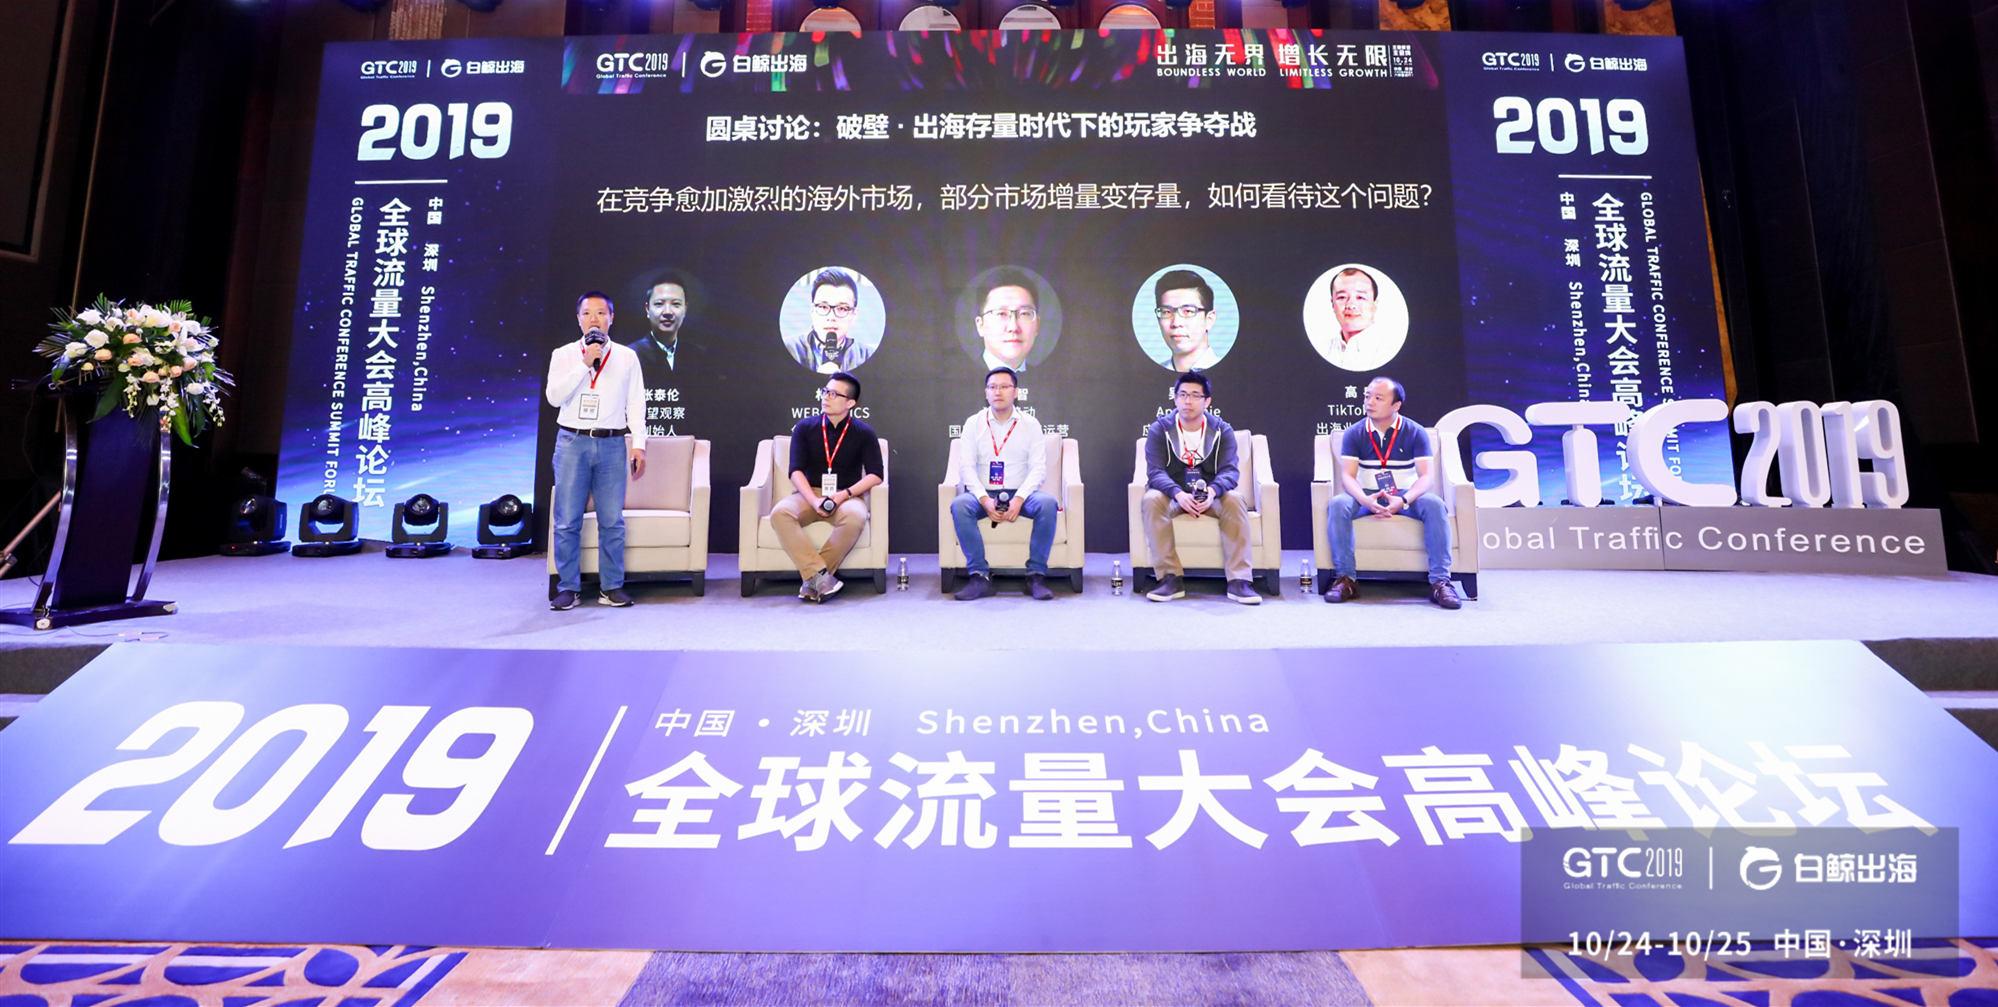 GTC现场丨2019全球流量大会深圳举办,猎豹移动携AI智能机器人助力企业探索出海新商机!